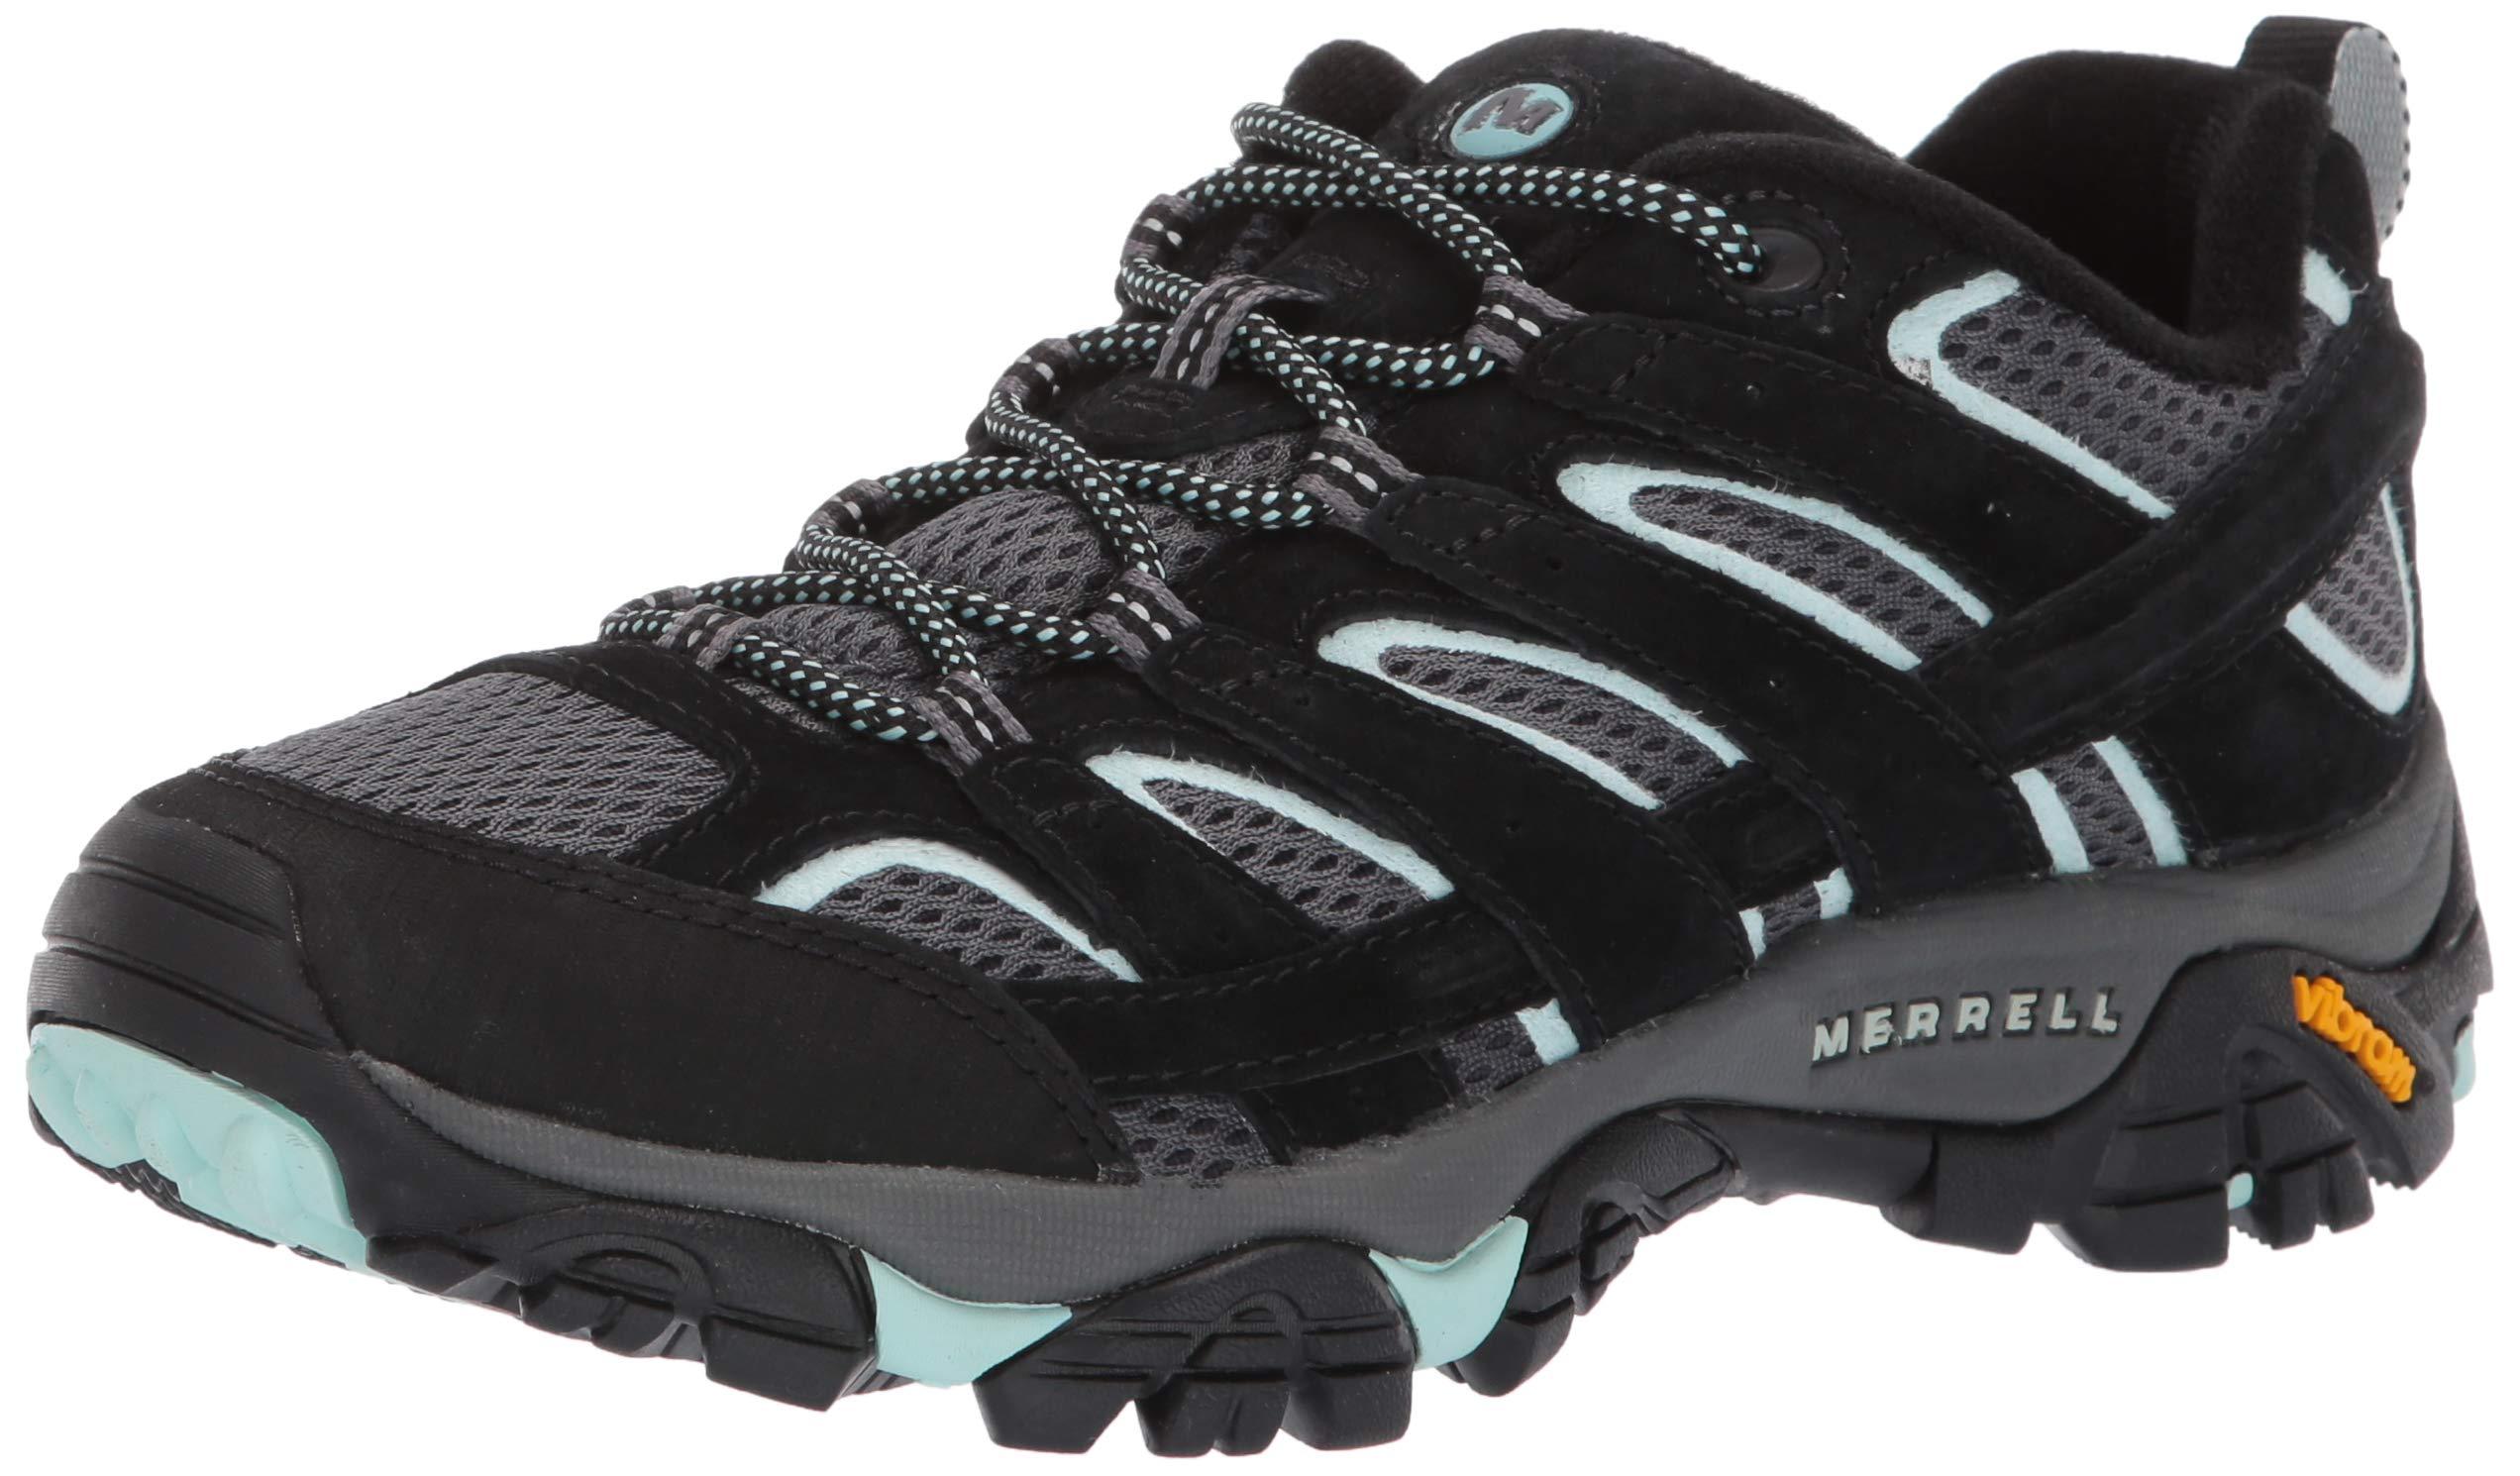 Merrell Women's Moab 2 Vent Hiking Shoe, Black Aqua 05.0 M US